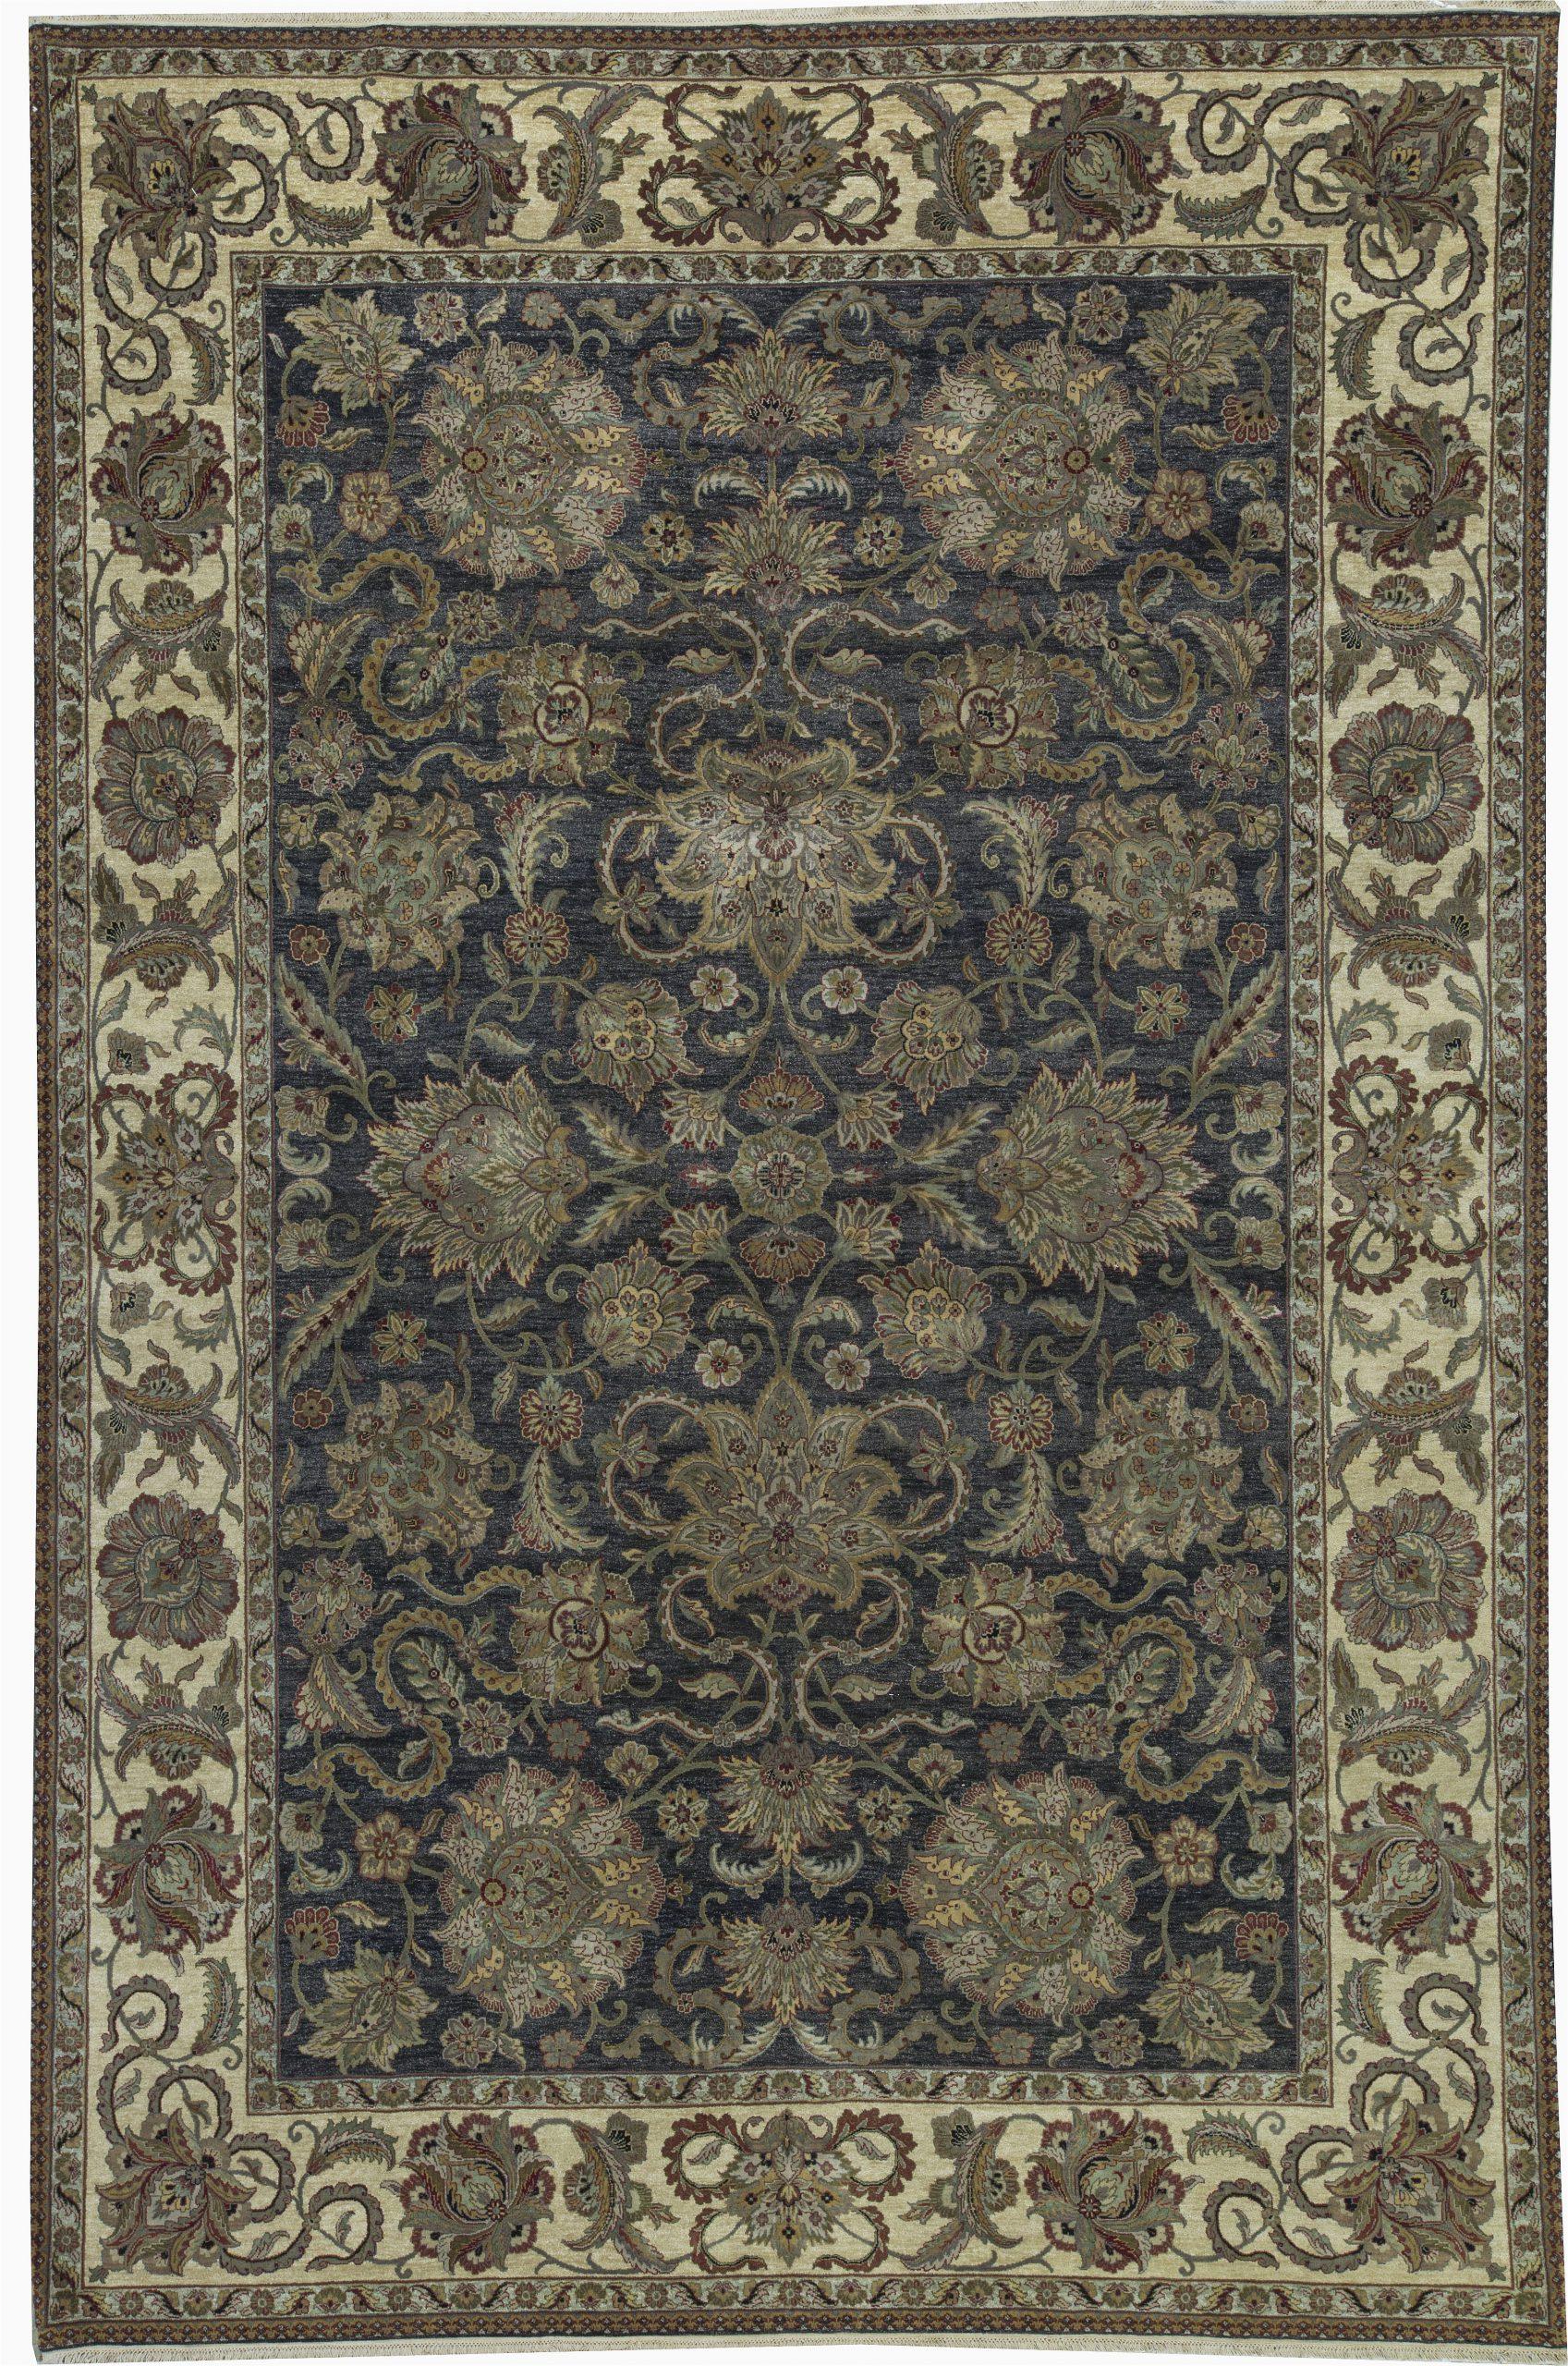 bokara rug co inc one of a kind mountain king handwoven 1110 x 179 wool green area rug abhd2785